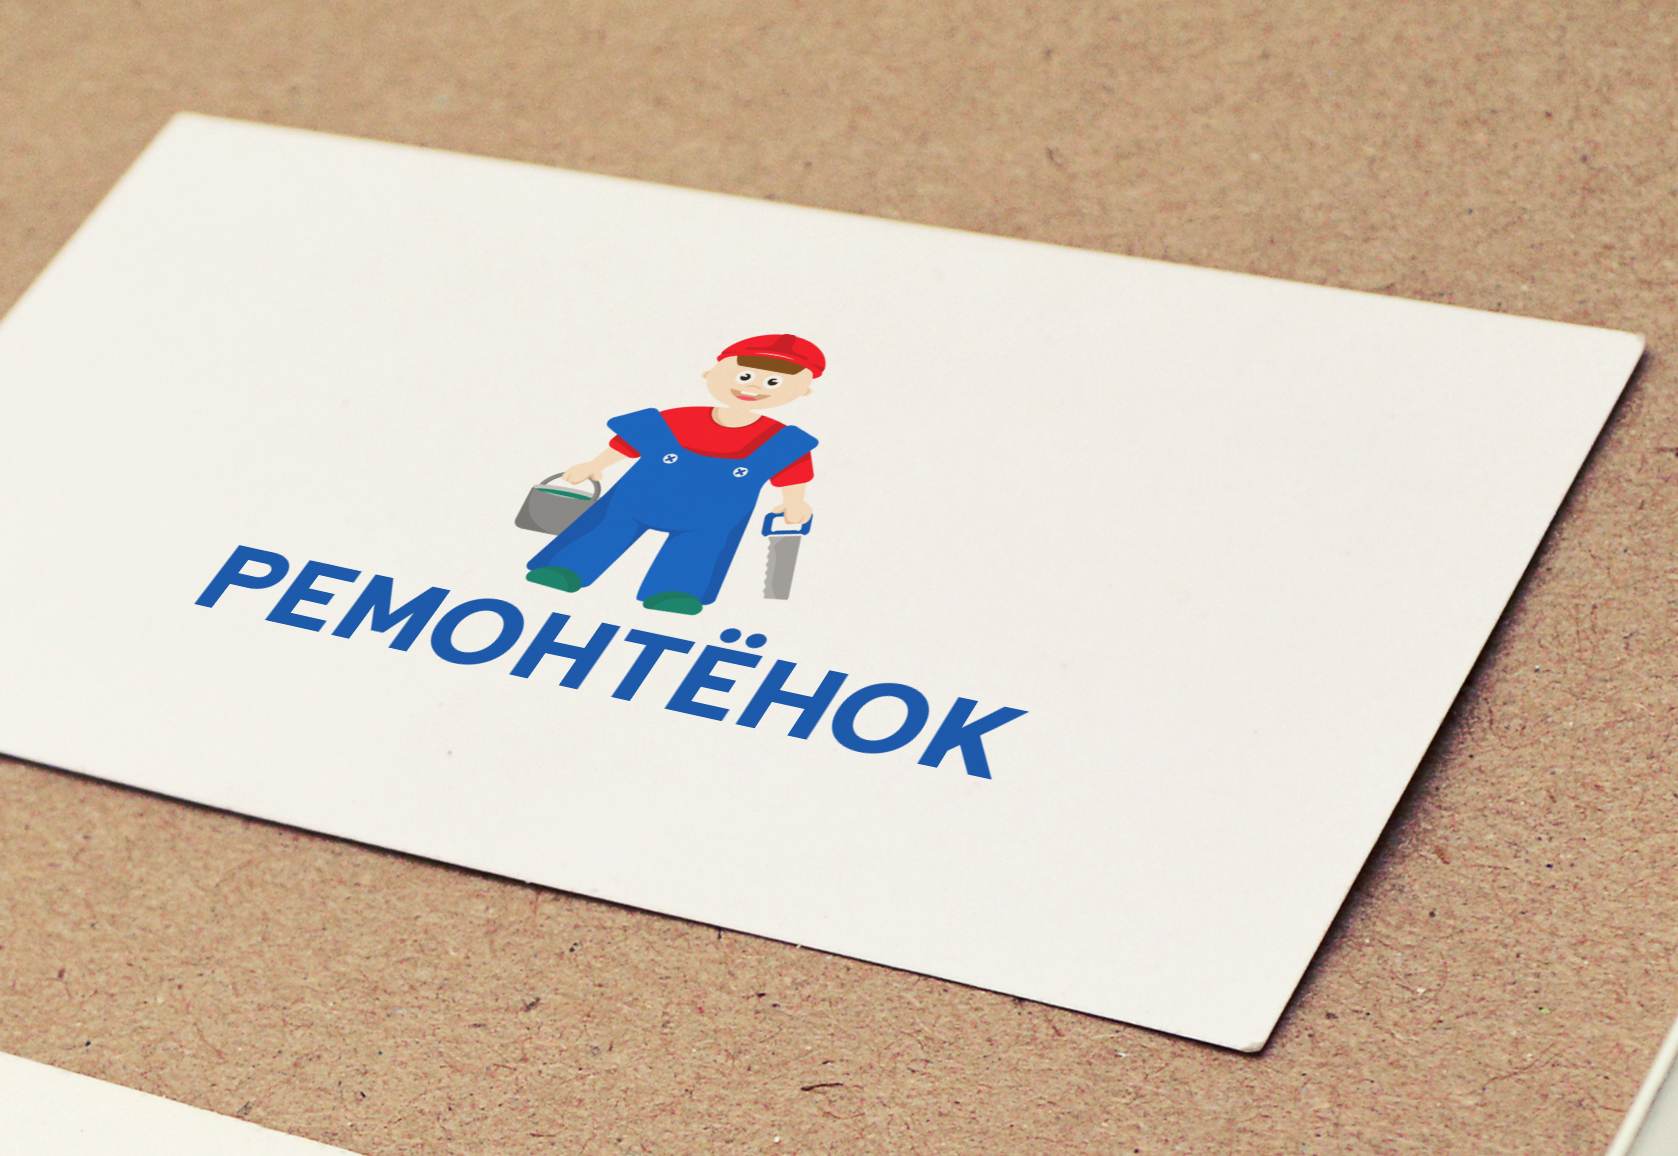 Ремонтёнок: логотип + брэндбук + фирменный стиль фото f_0315954e99b1aa69.jpg